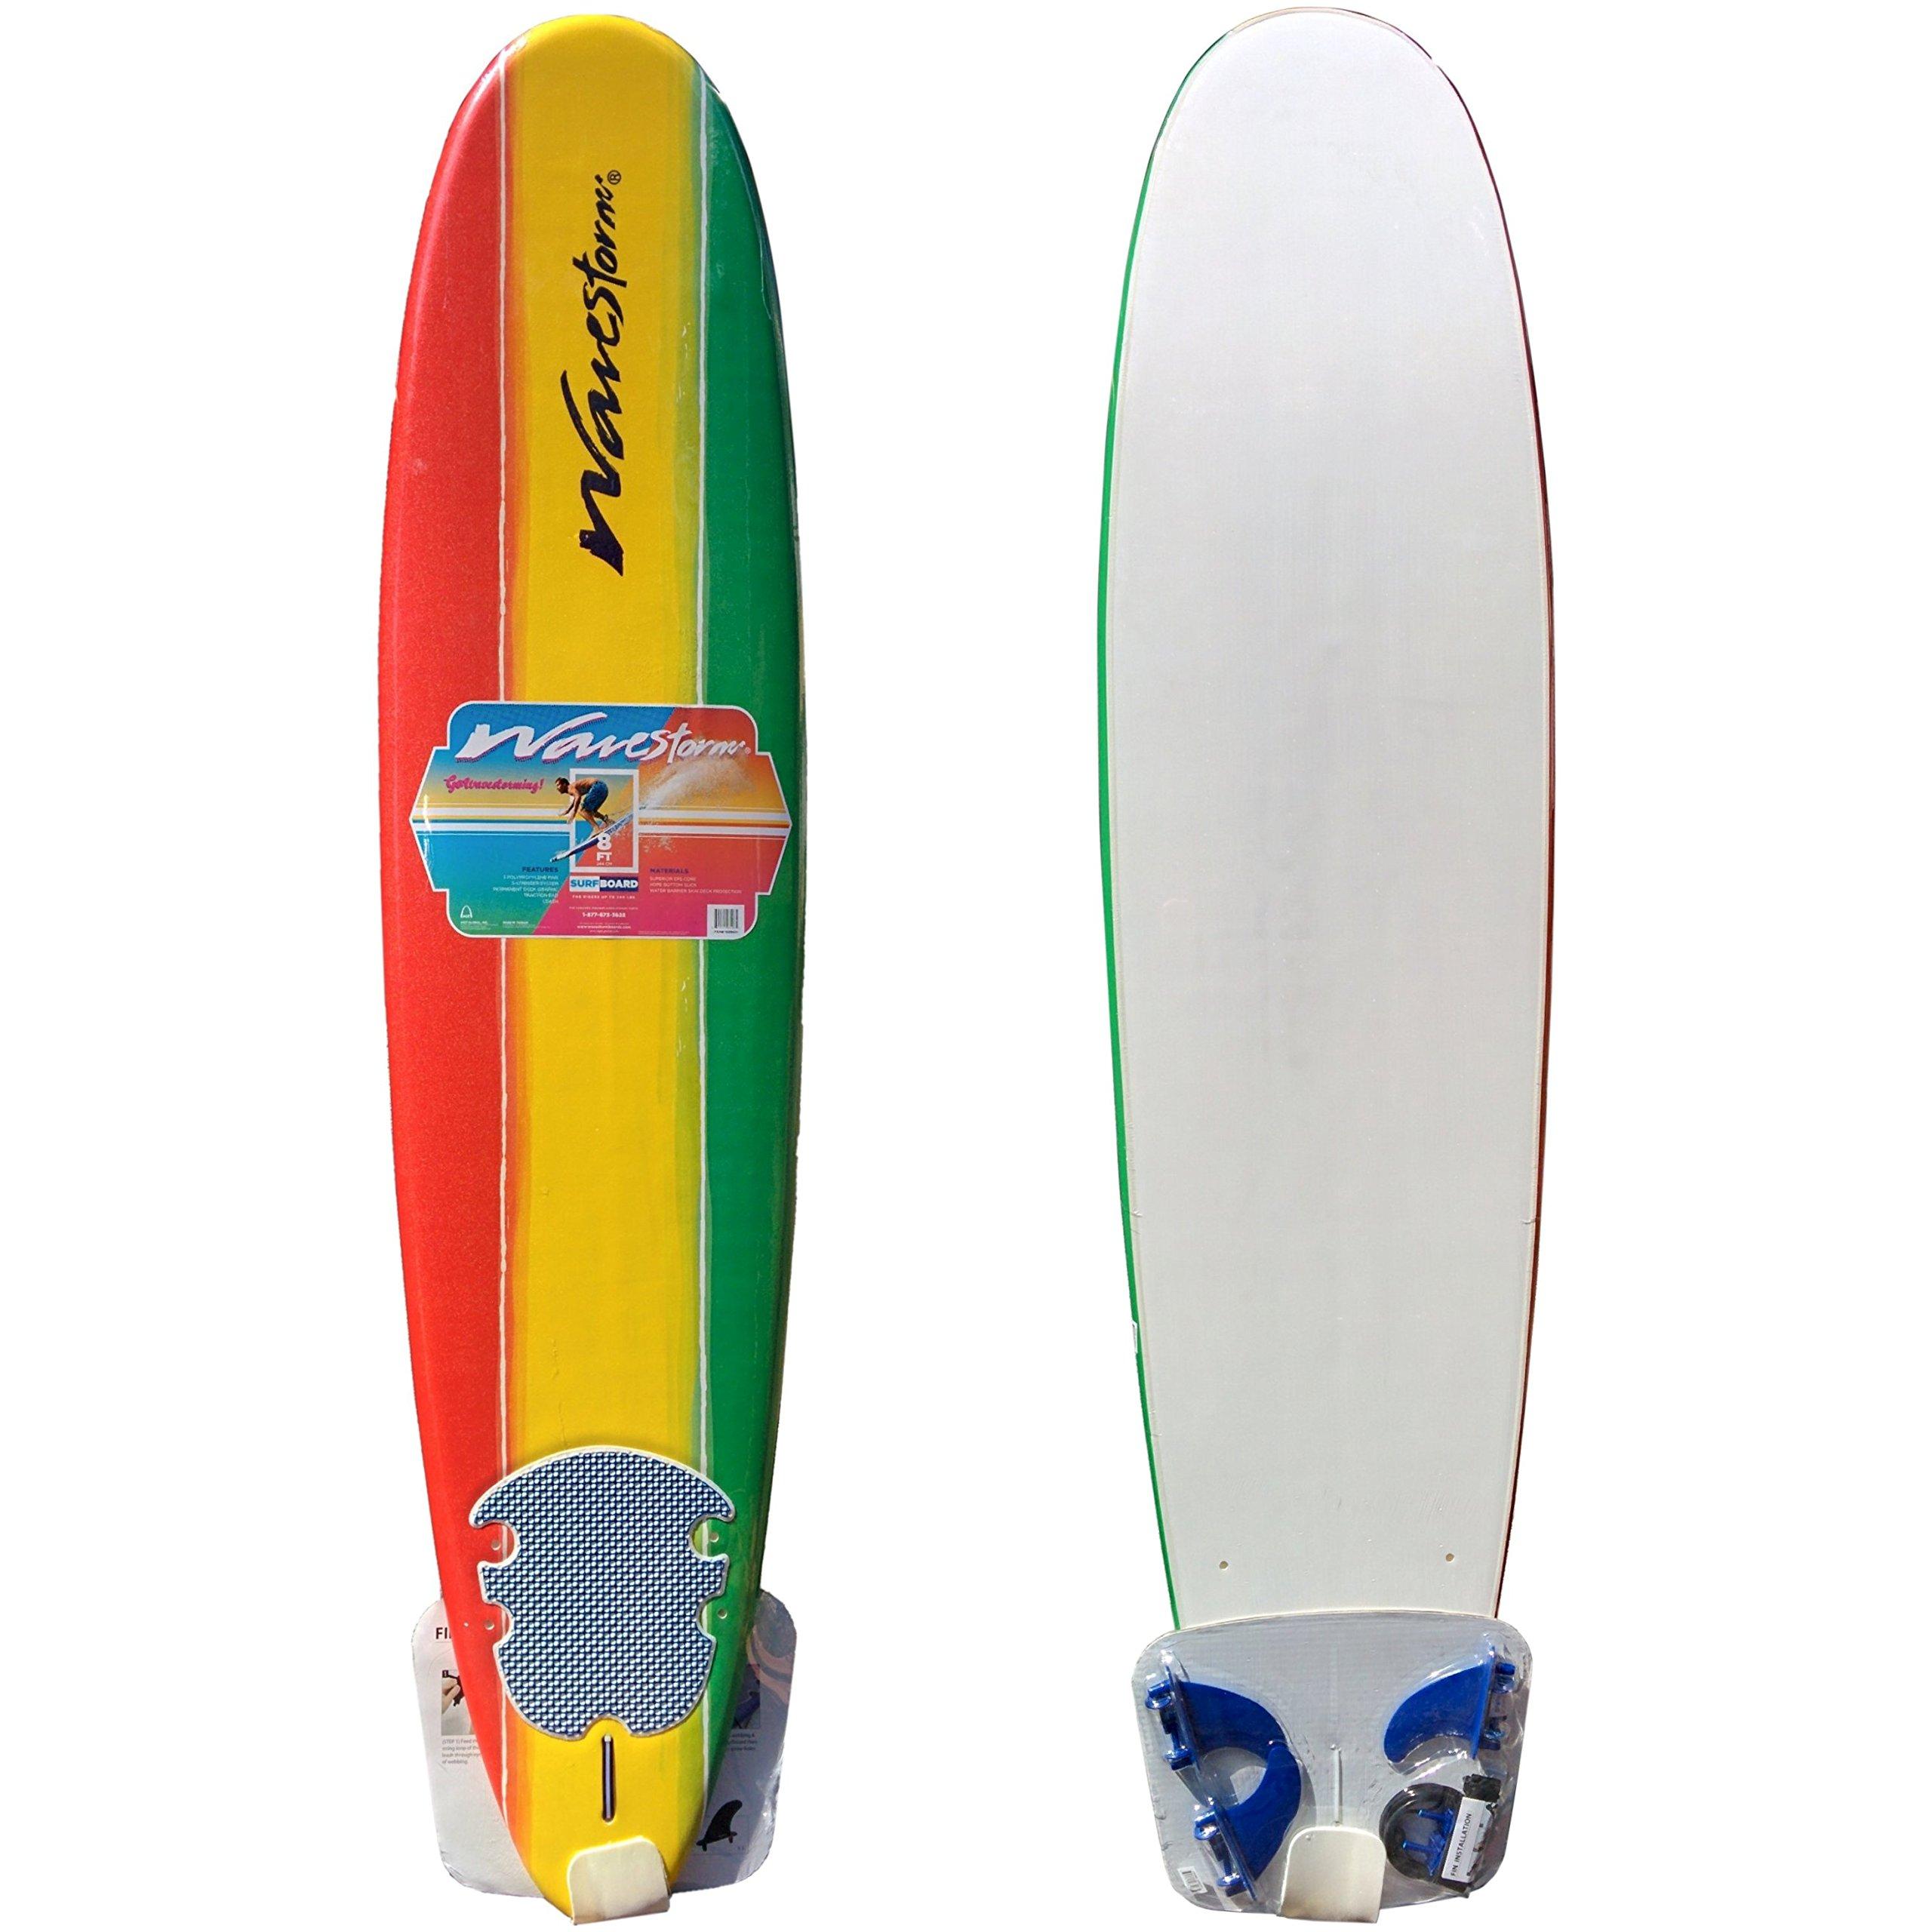 Wavestorm 8ft Classic Longboard Surfboard by Wavestorm (Image #1)